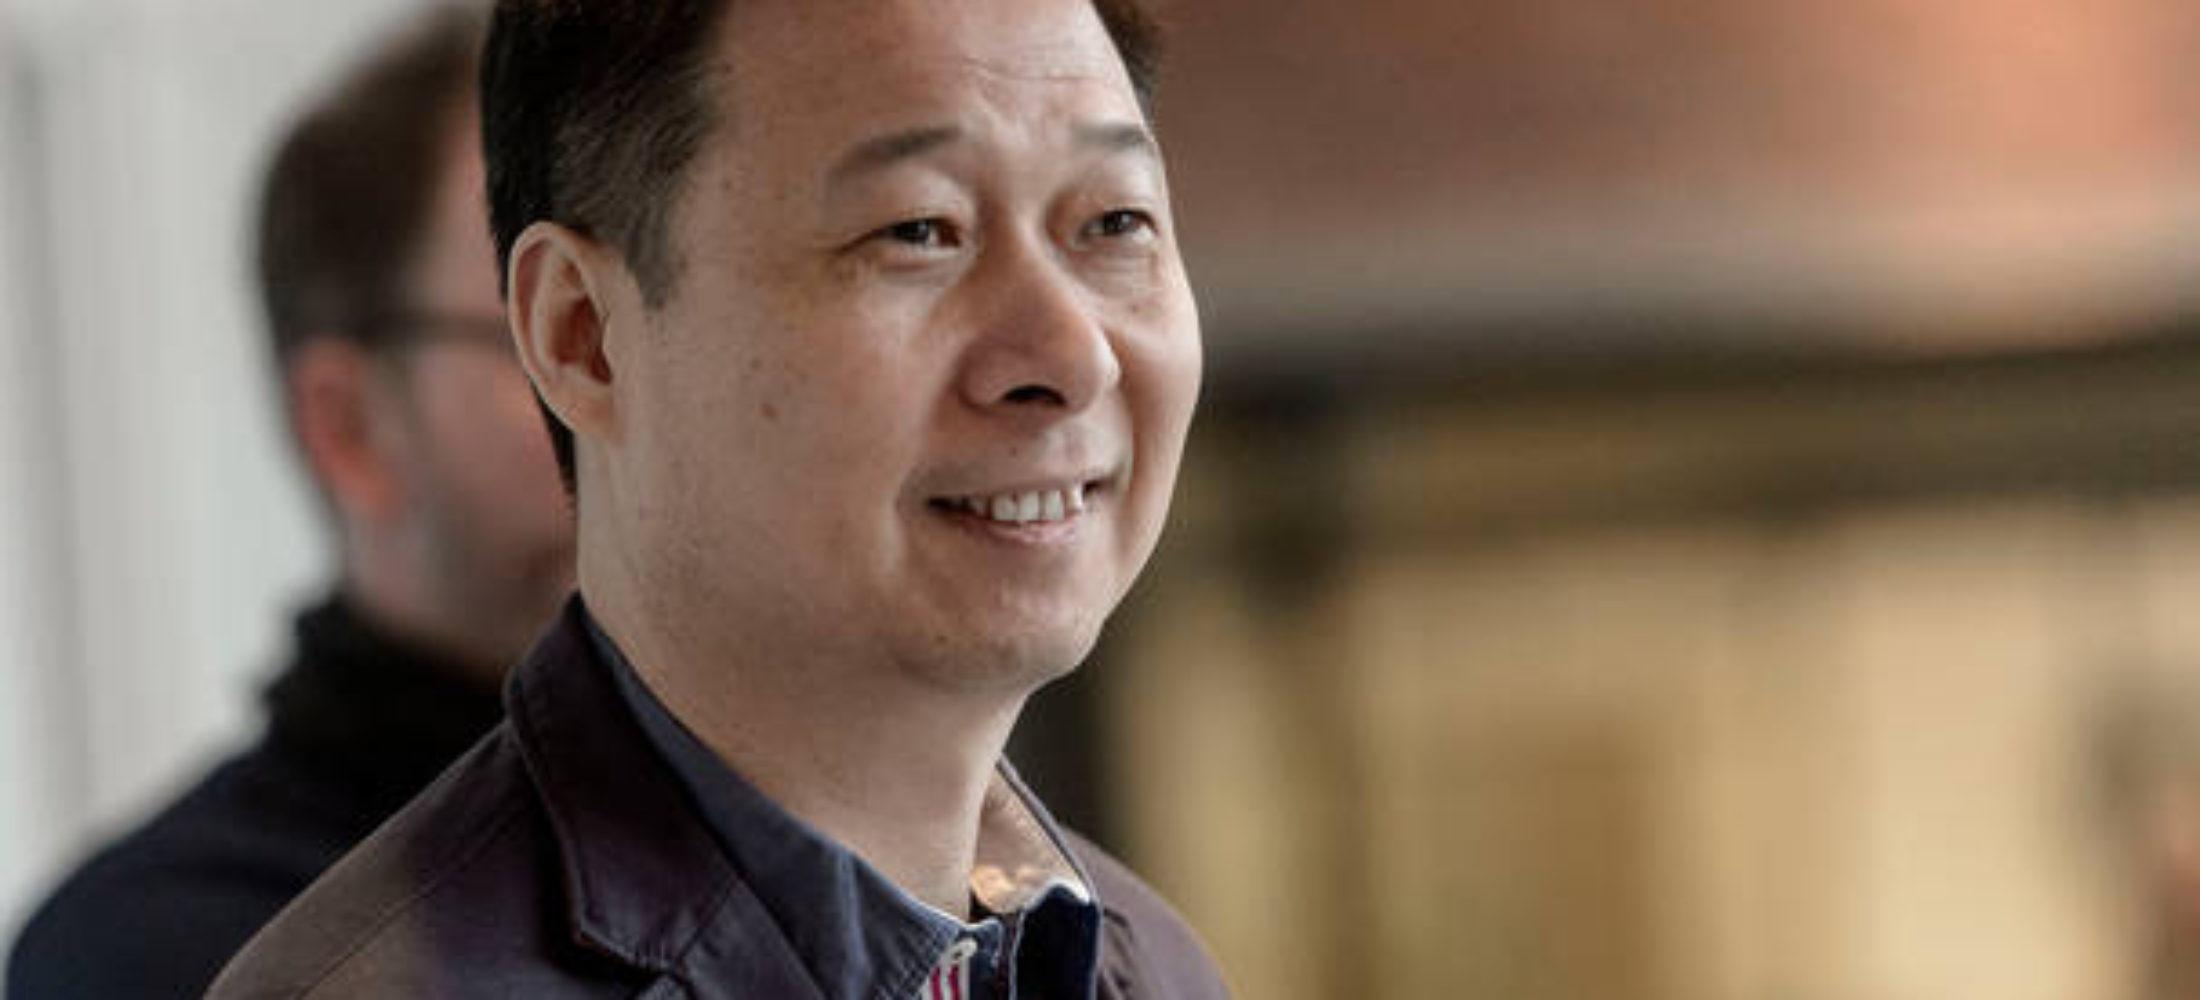 Nyborgs kinesiske investor: Havde fattig barndom uden drømme